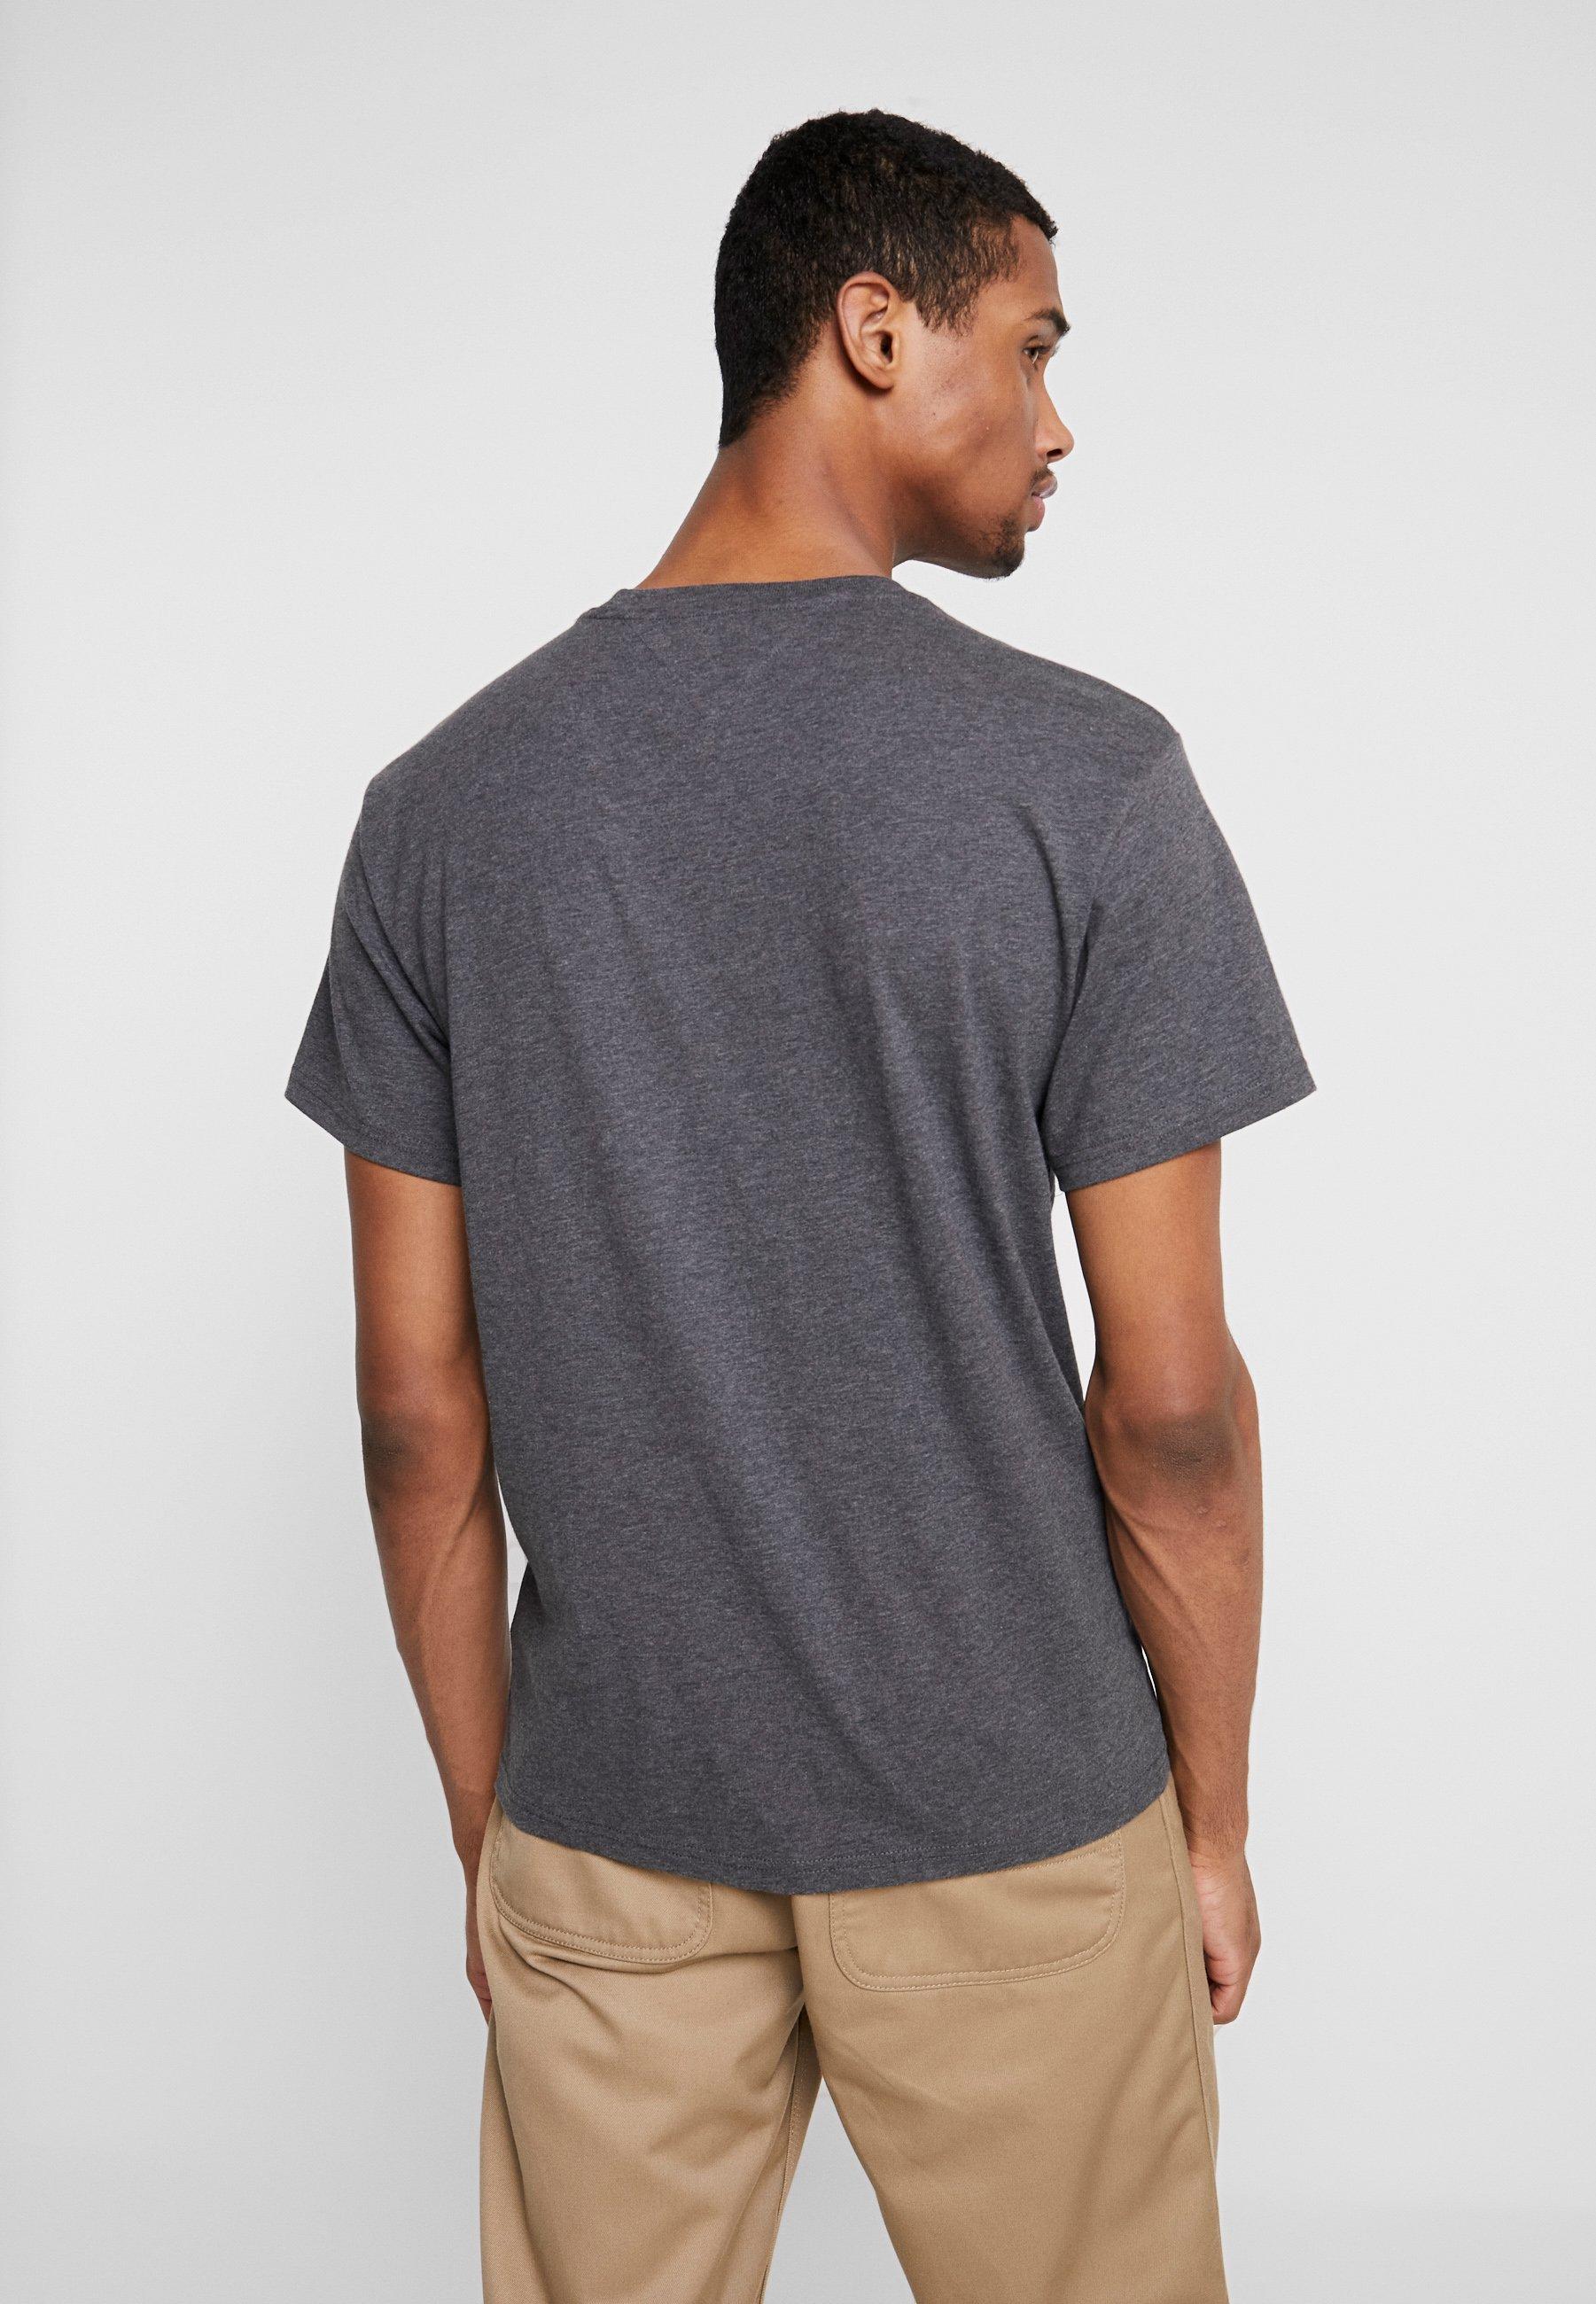 Dark Twisted Logo shirt Grey Small Tommy Imprimé TeeT Jeans WED2YIH9